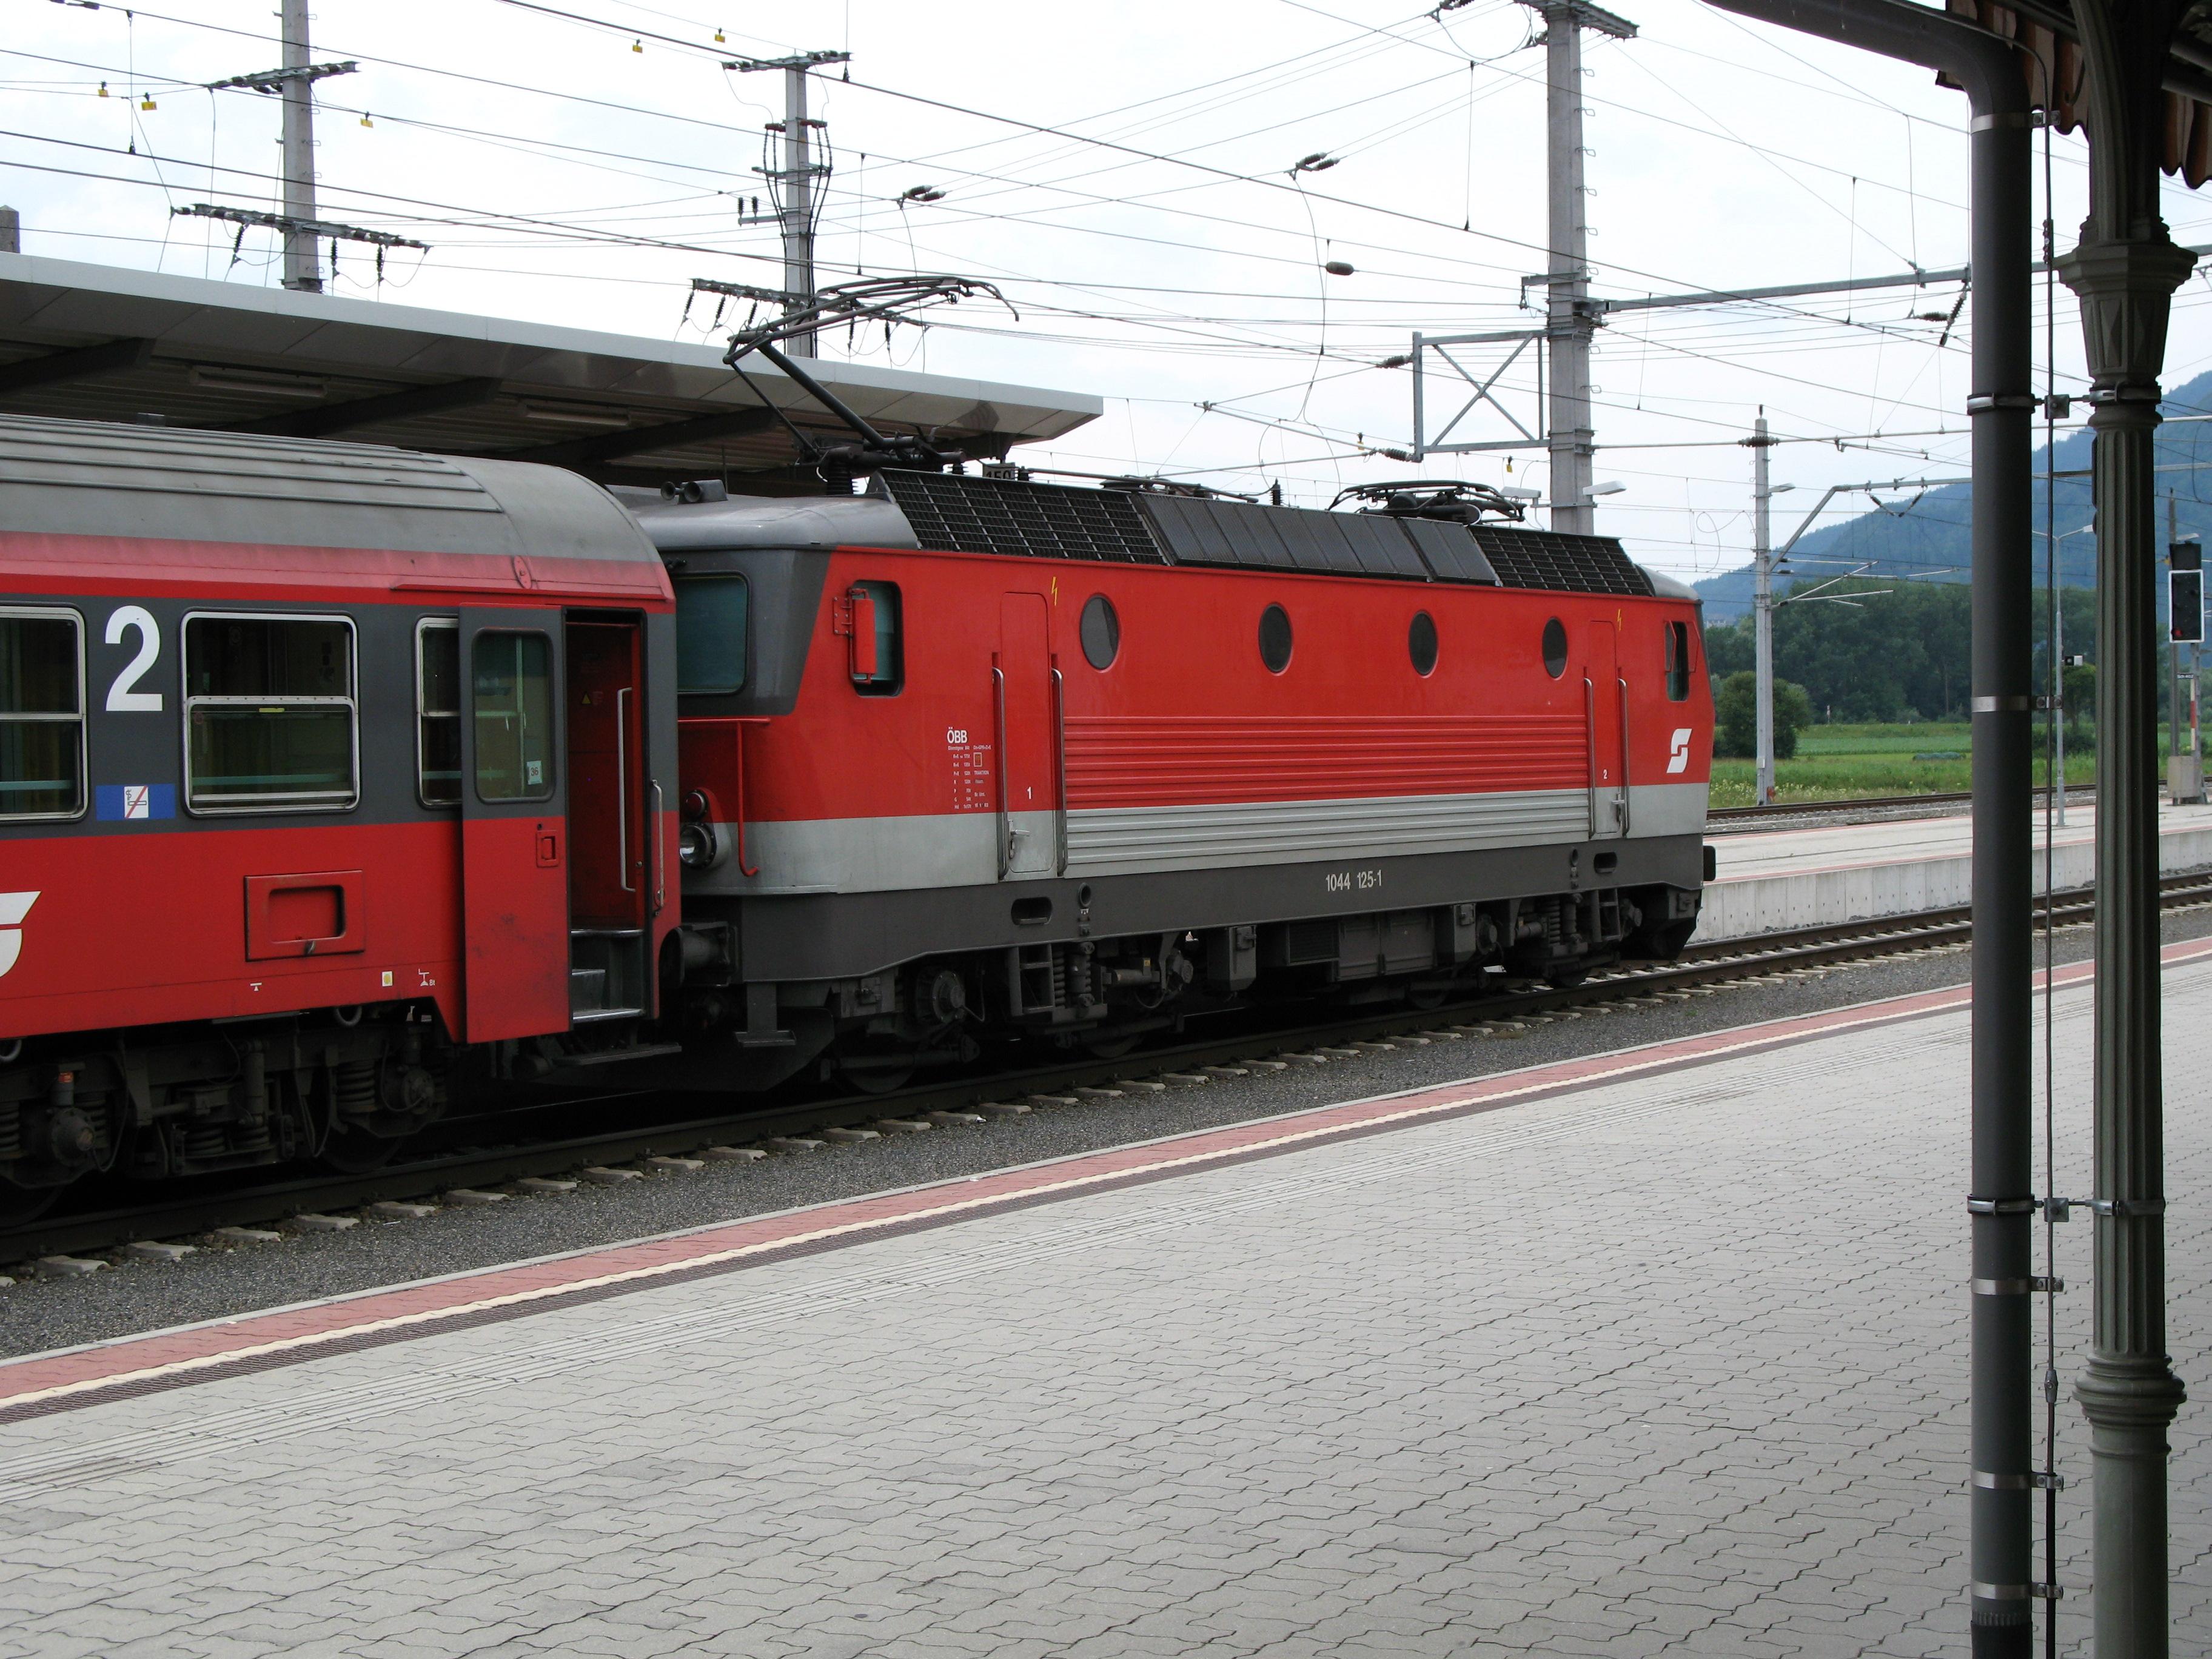 File:0671 - Stainach-Irding - ÖBB Class 1044.JPG